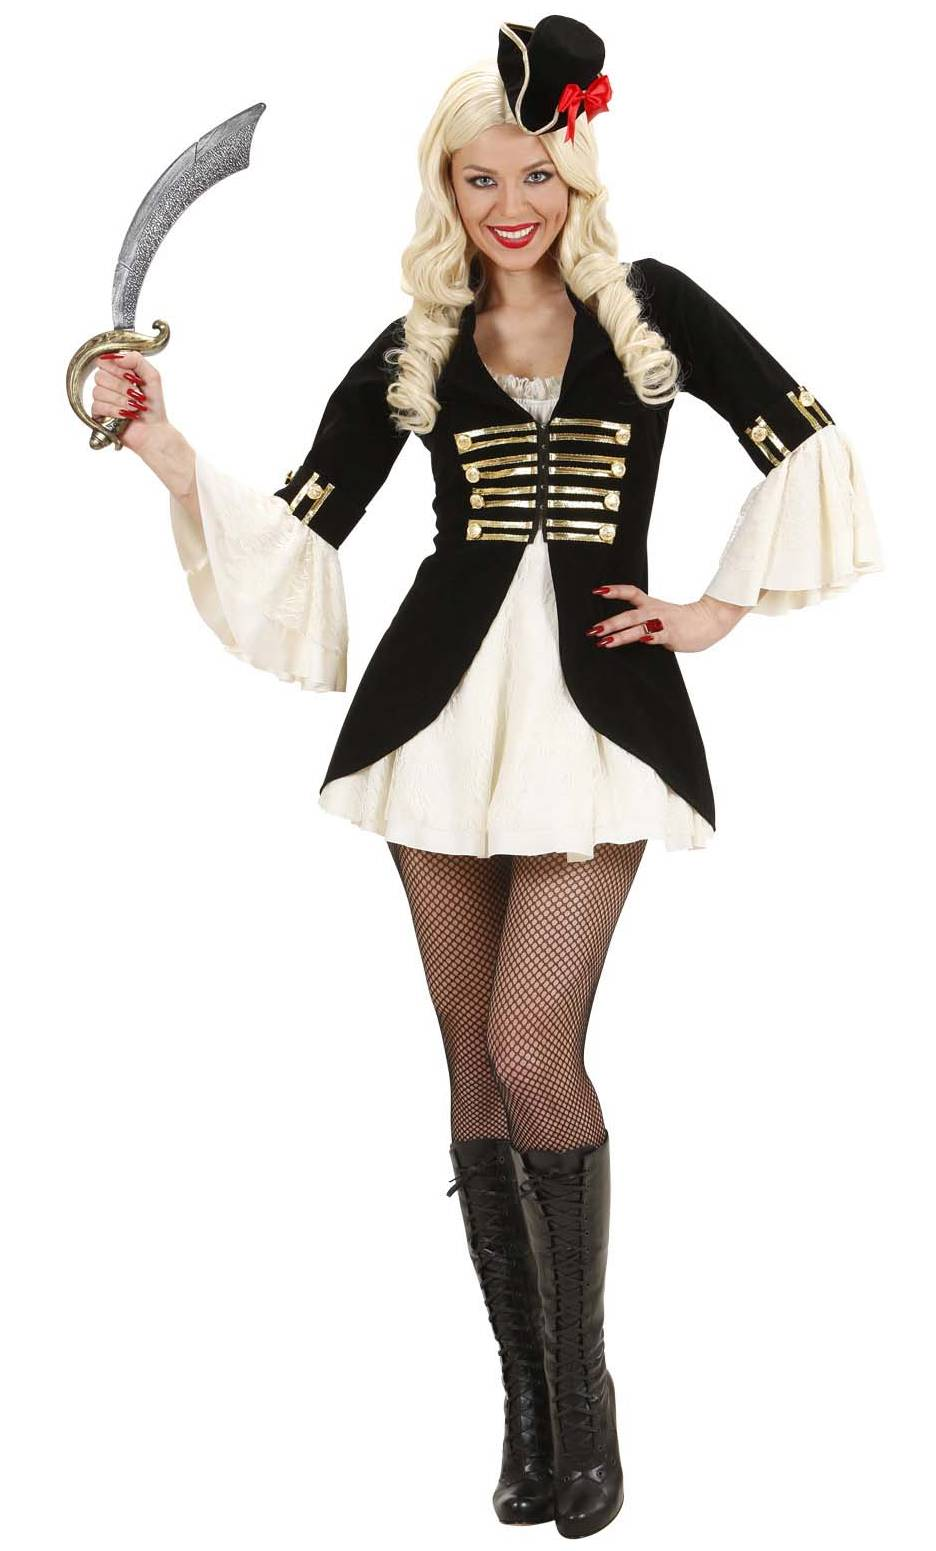 Costume-Pirate-Femme-Grande-Taille-XL